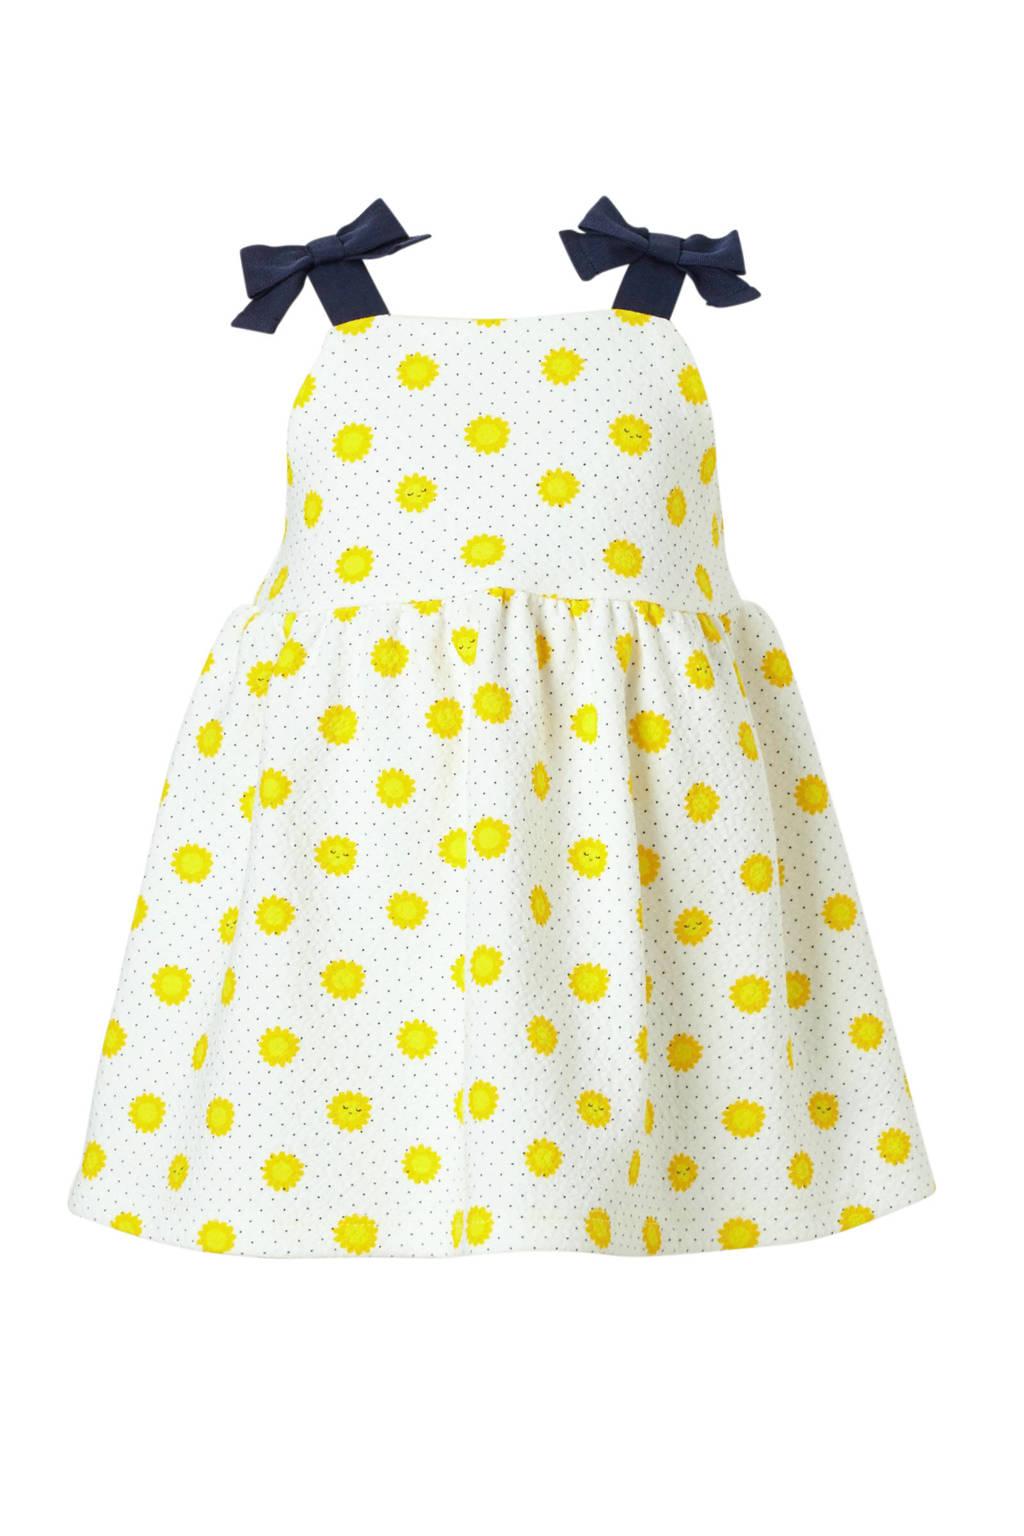 C&A Baby Club jurk met zonnetjes ecru, Ecru/geel